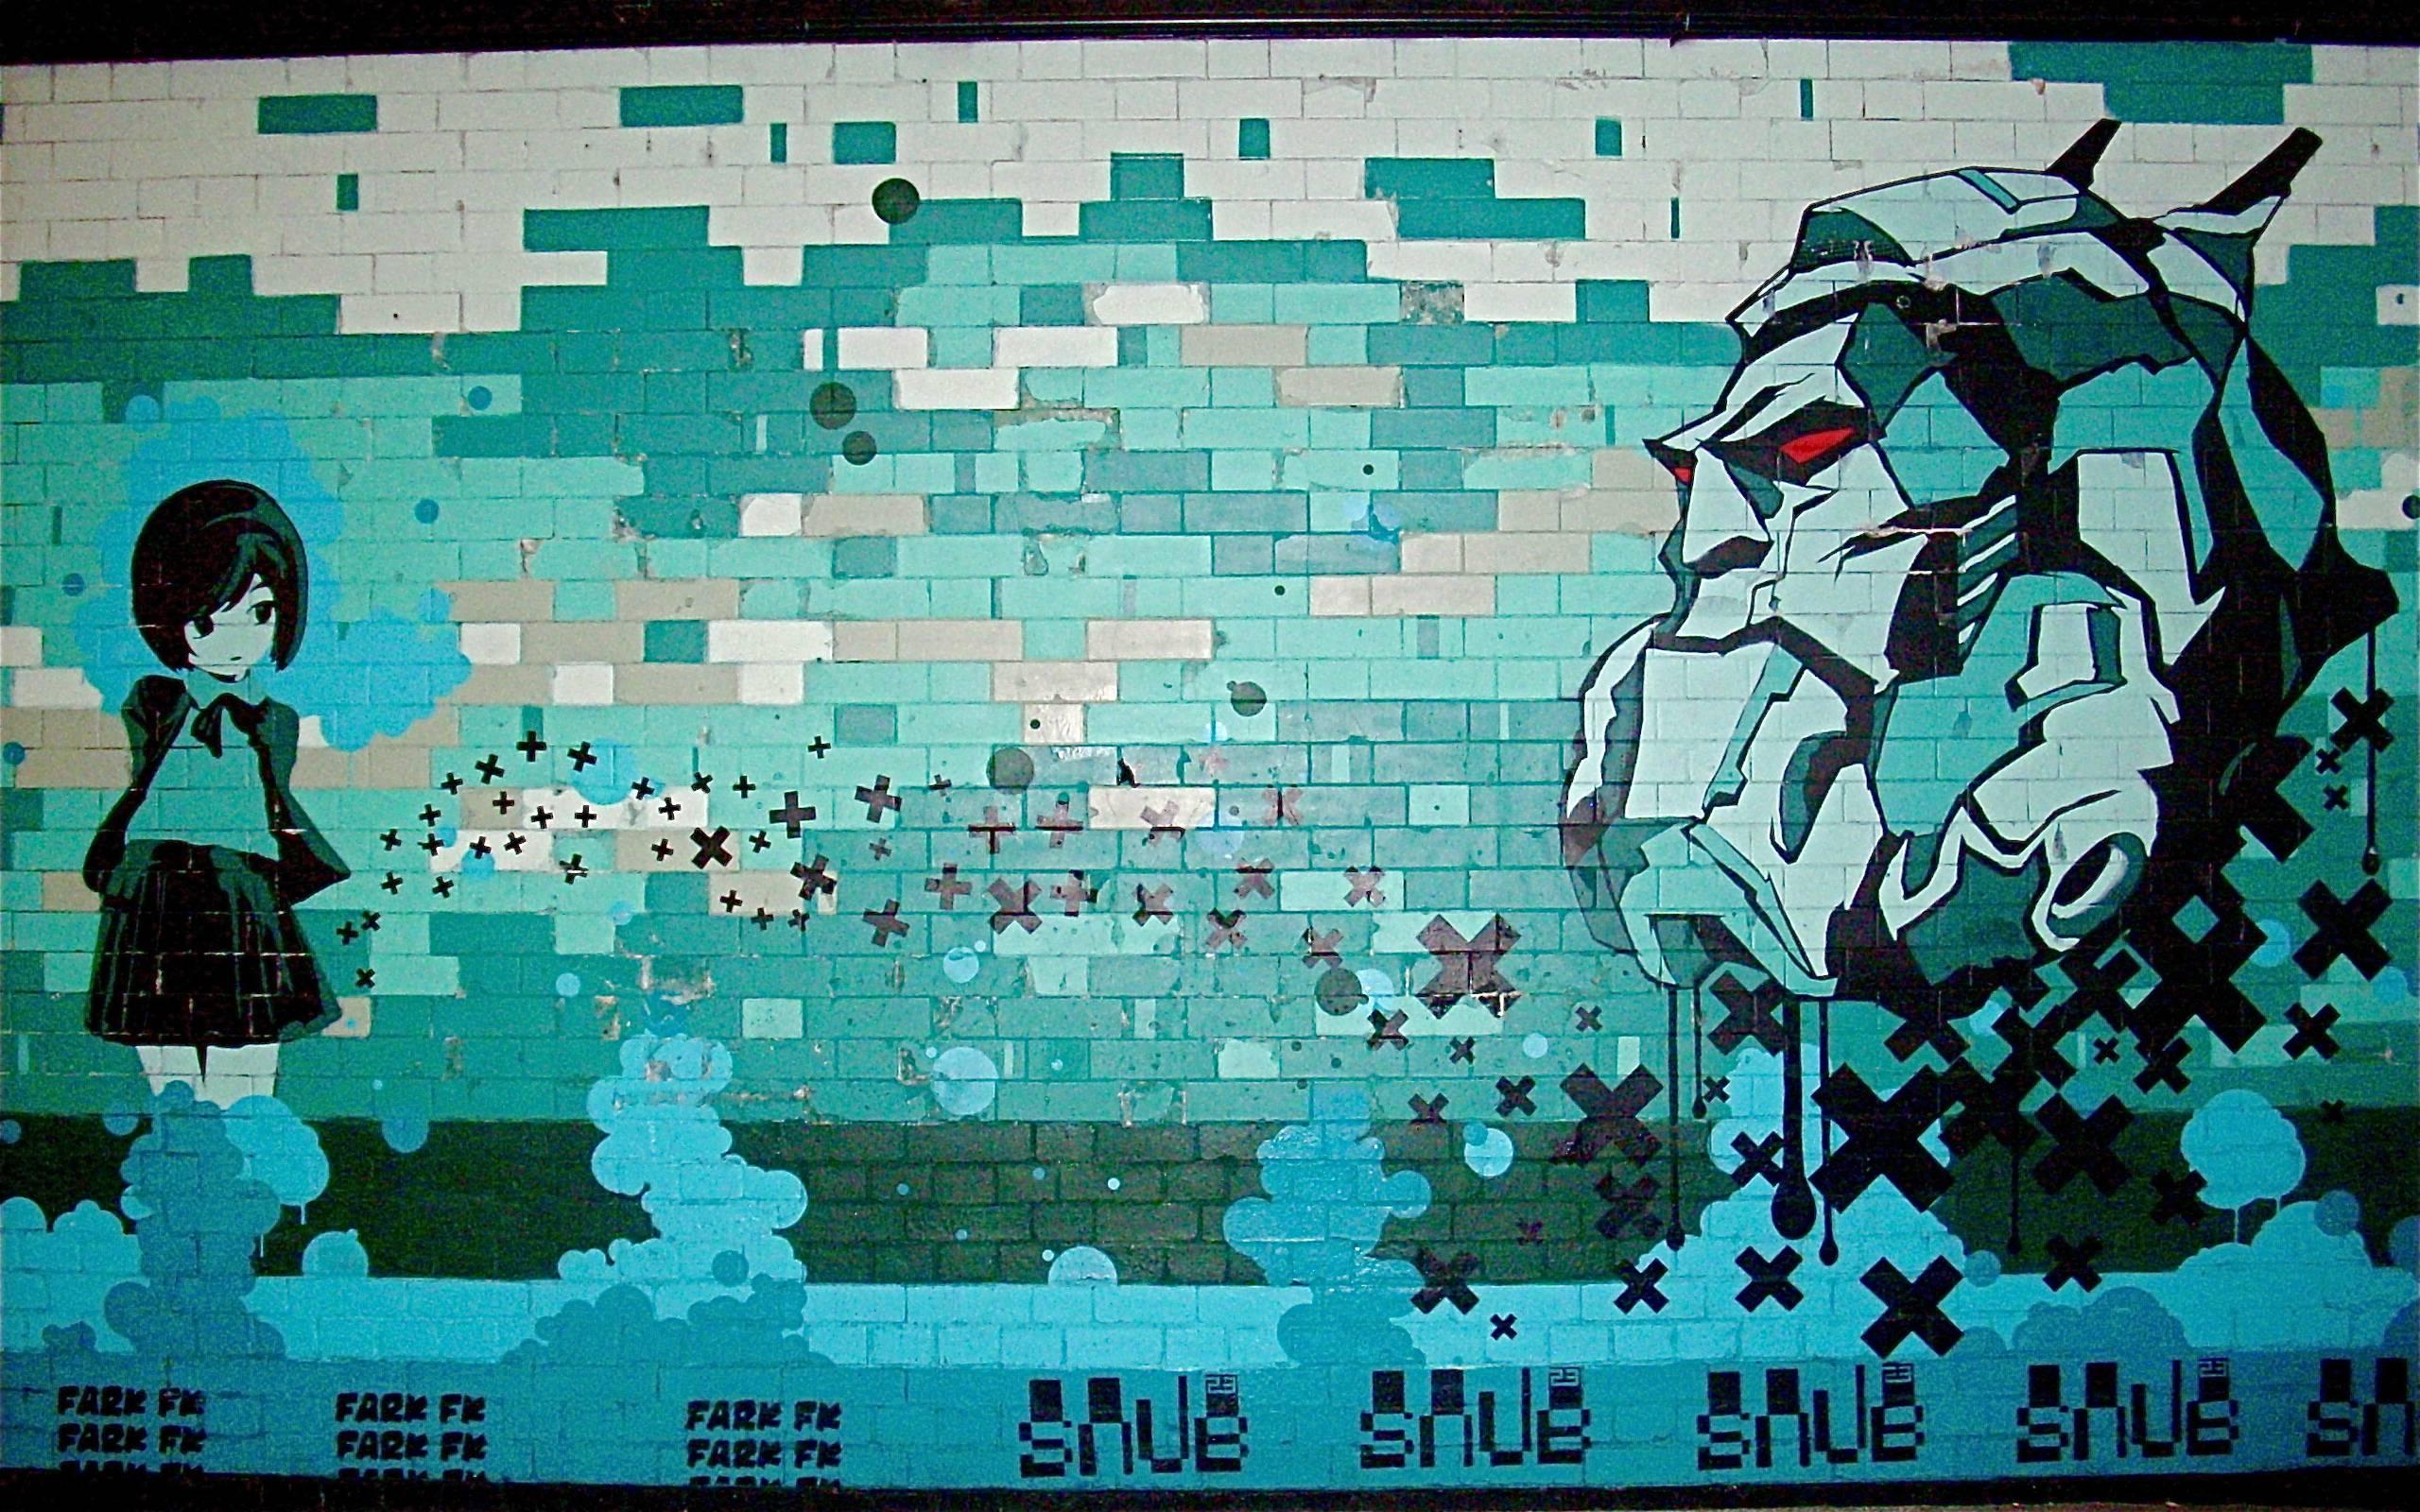 Graffiti wall wallpaper - Wallpapers For Graffiti Background For Tumblr